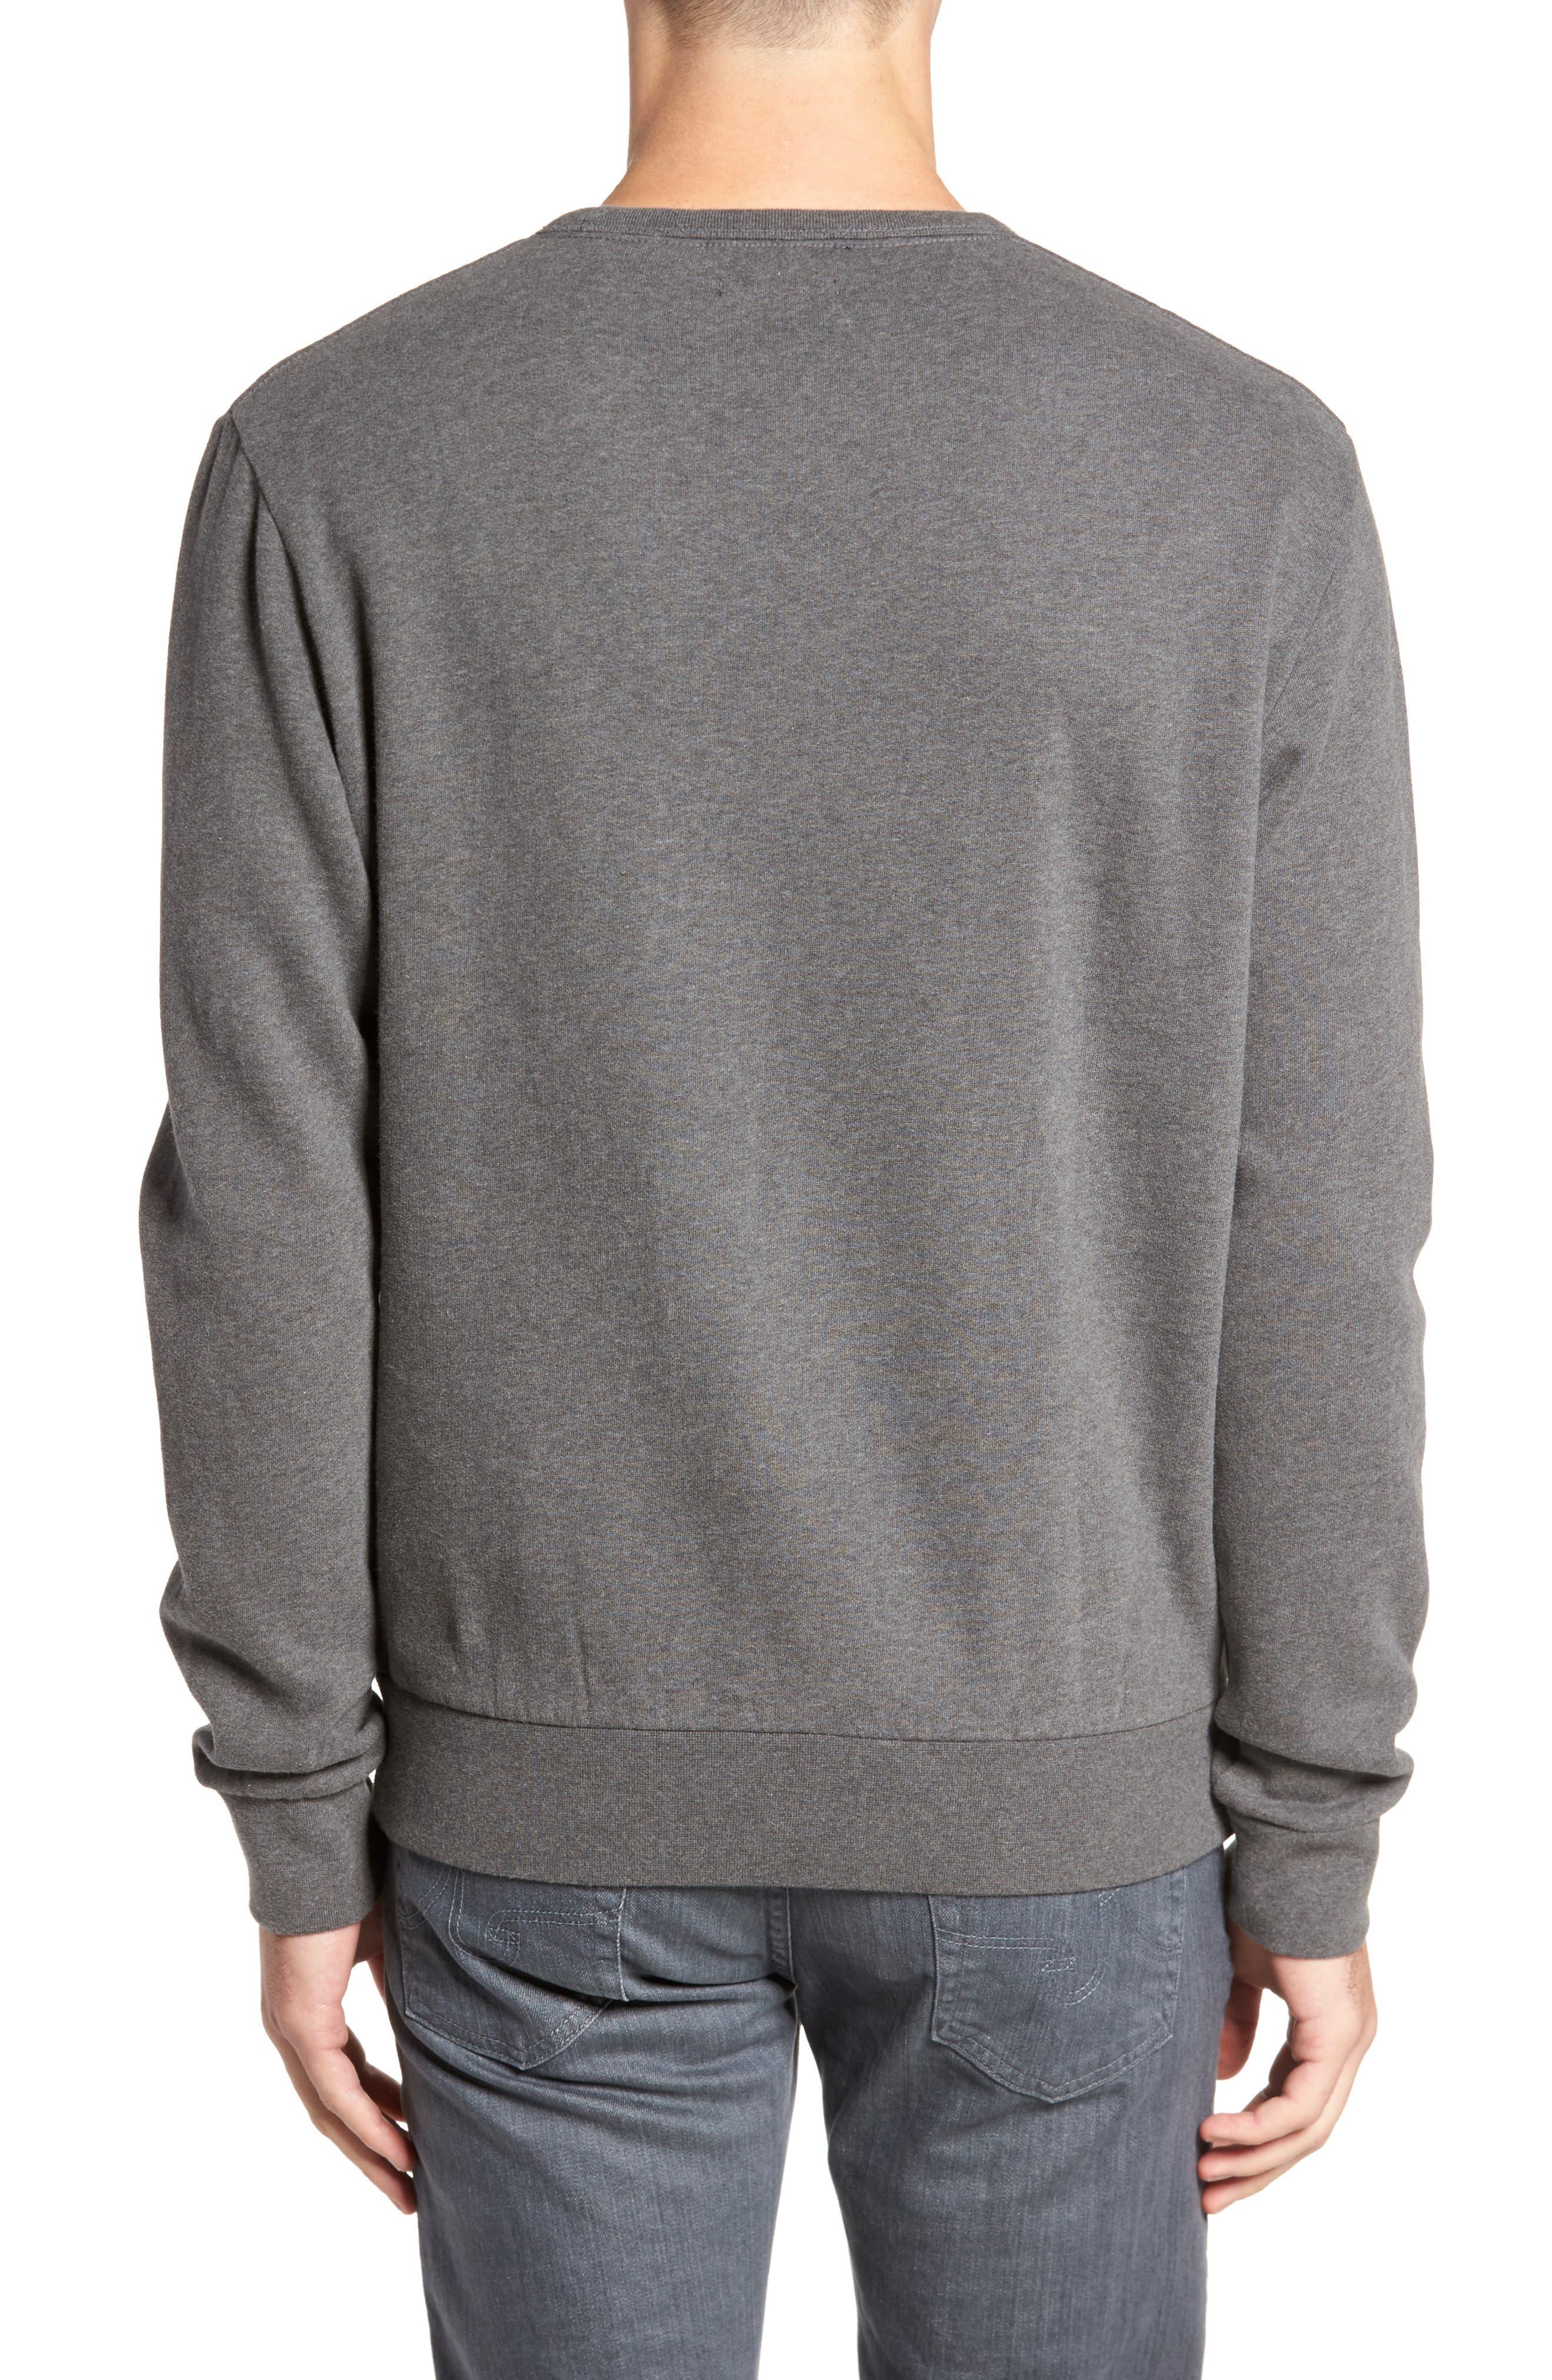 Tweed Appliqué Sweatshirt,                             Alternate thumbnail 2, color,                             Charcoal Melange